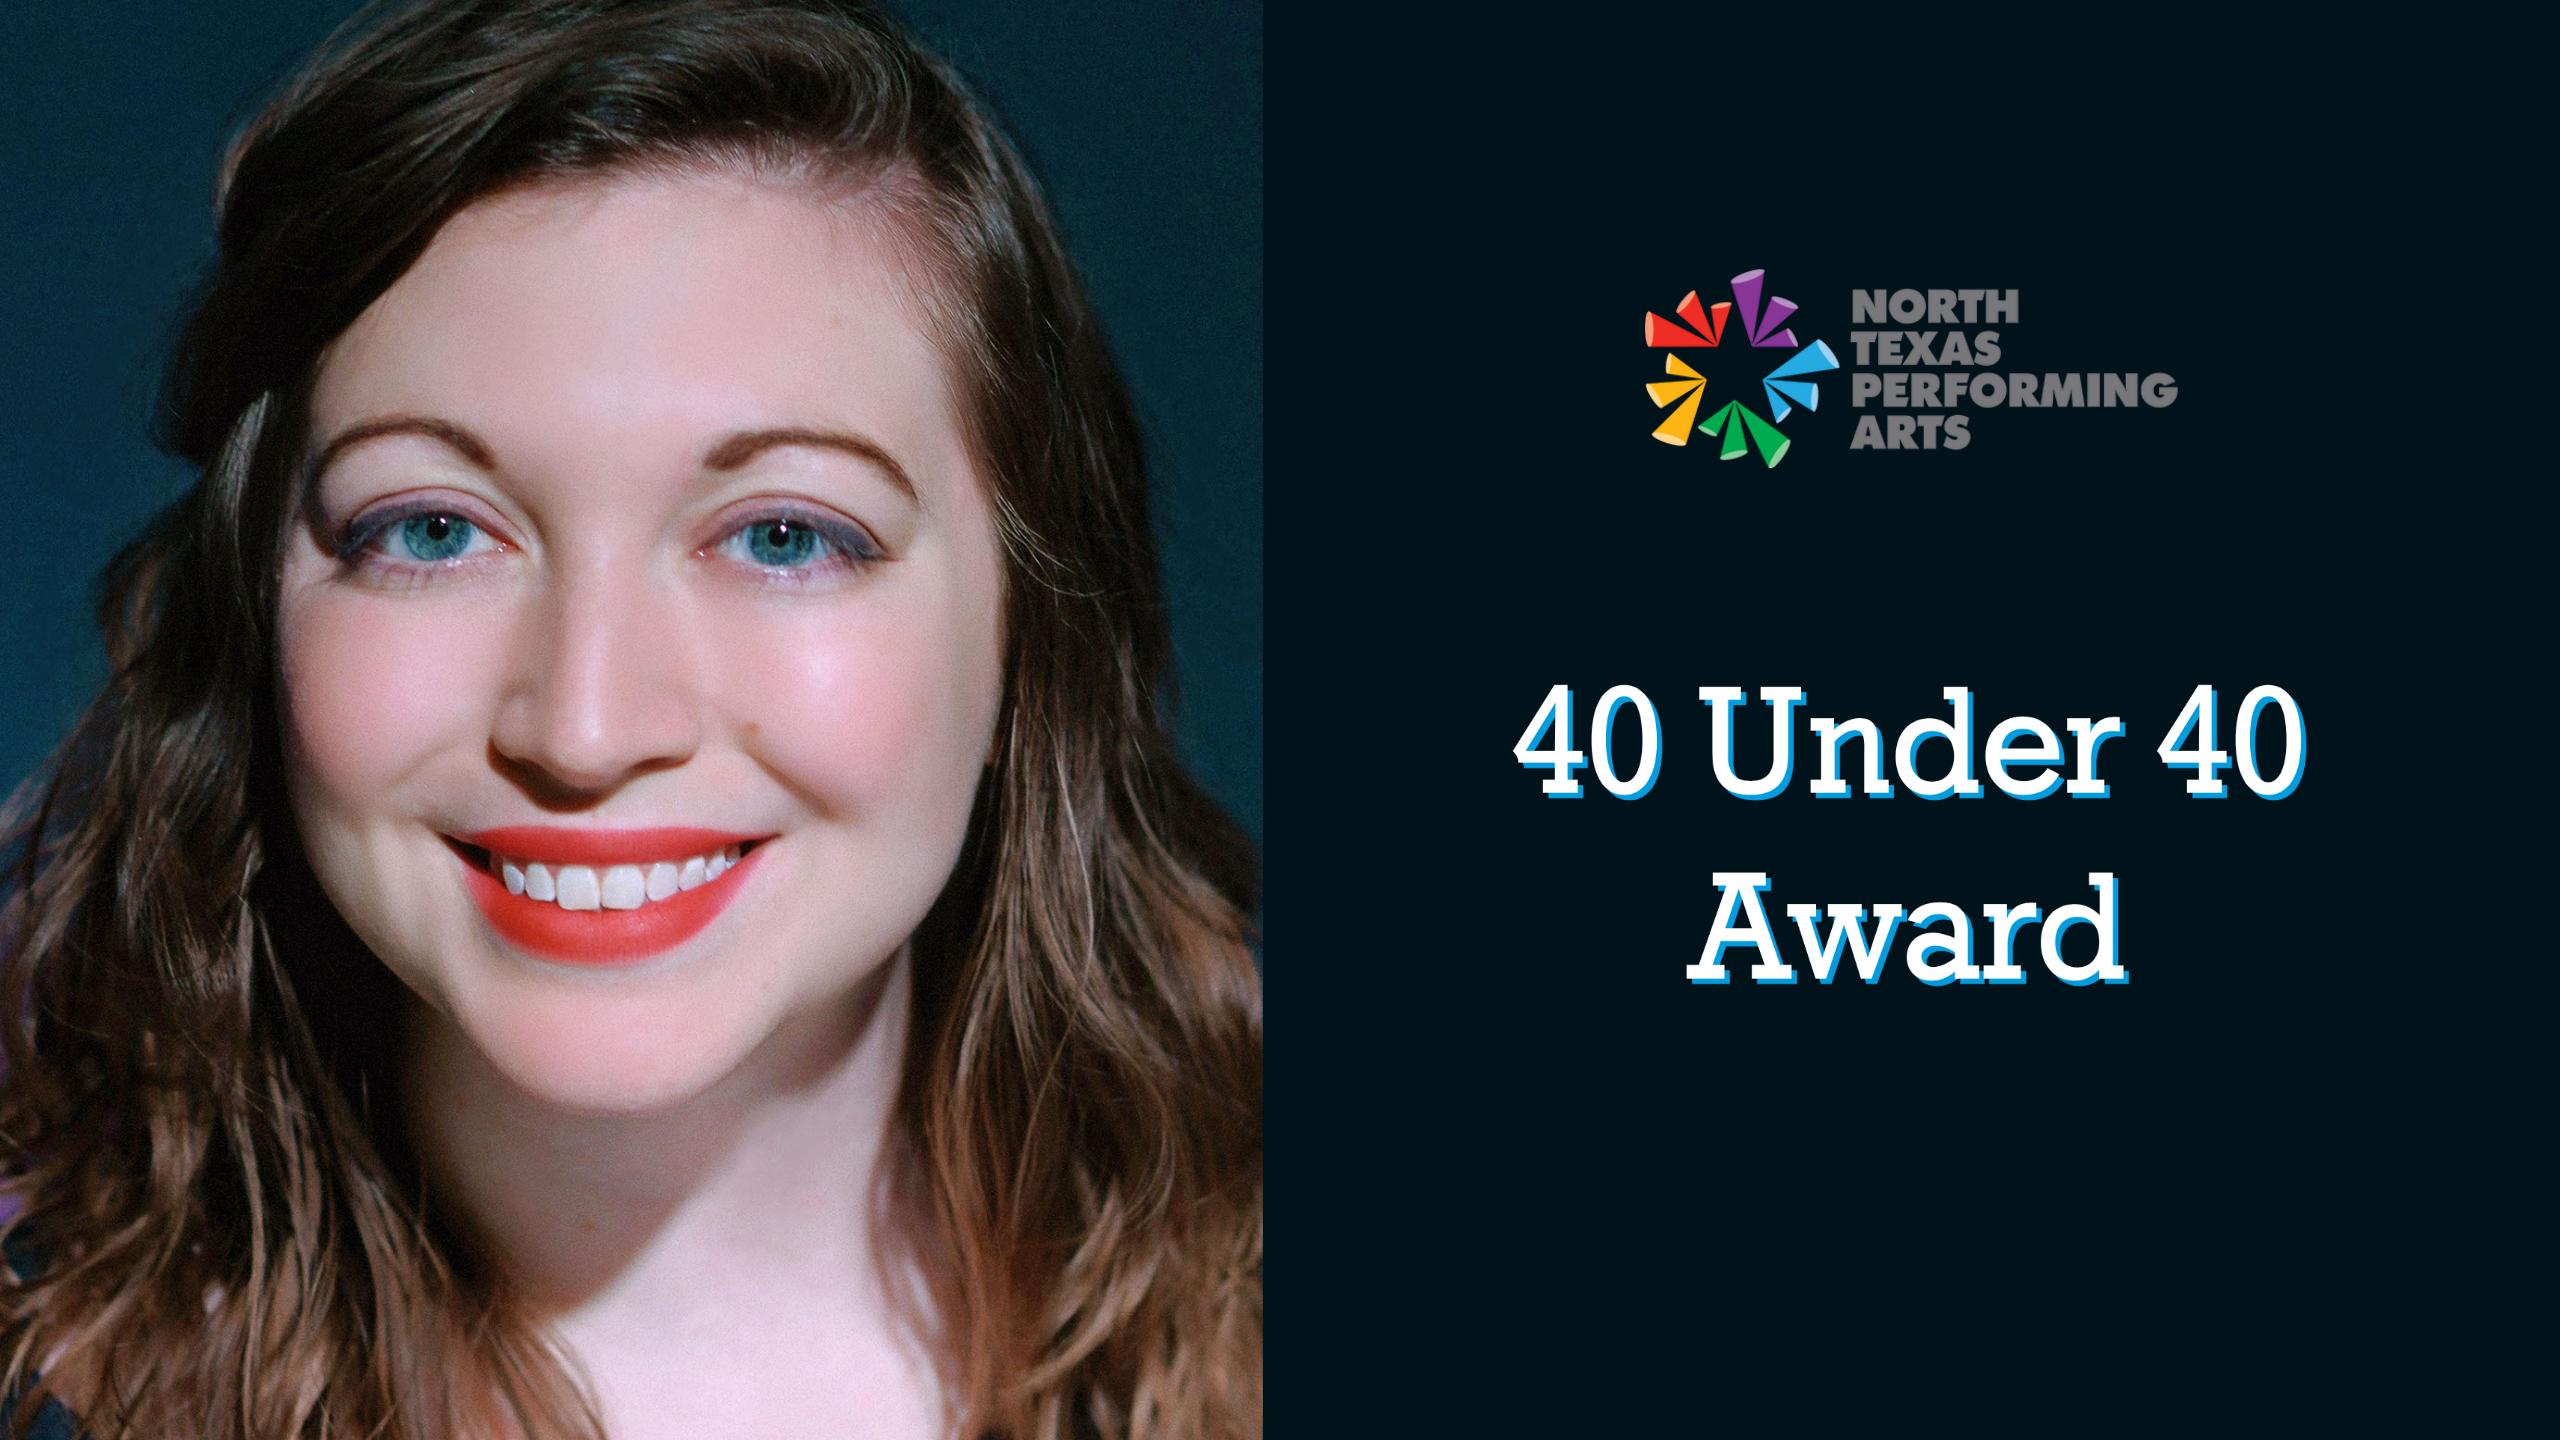 Senior Marketing Director, Lauren Boykin, selected for 40 Under 40 Award